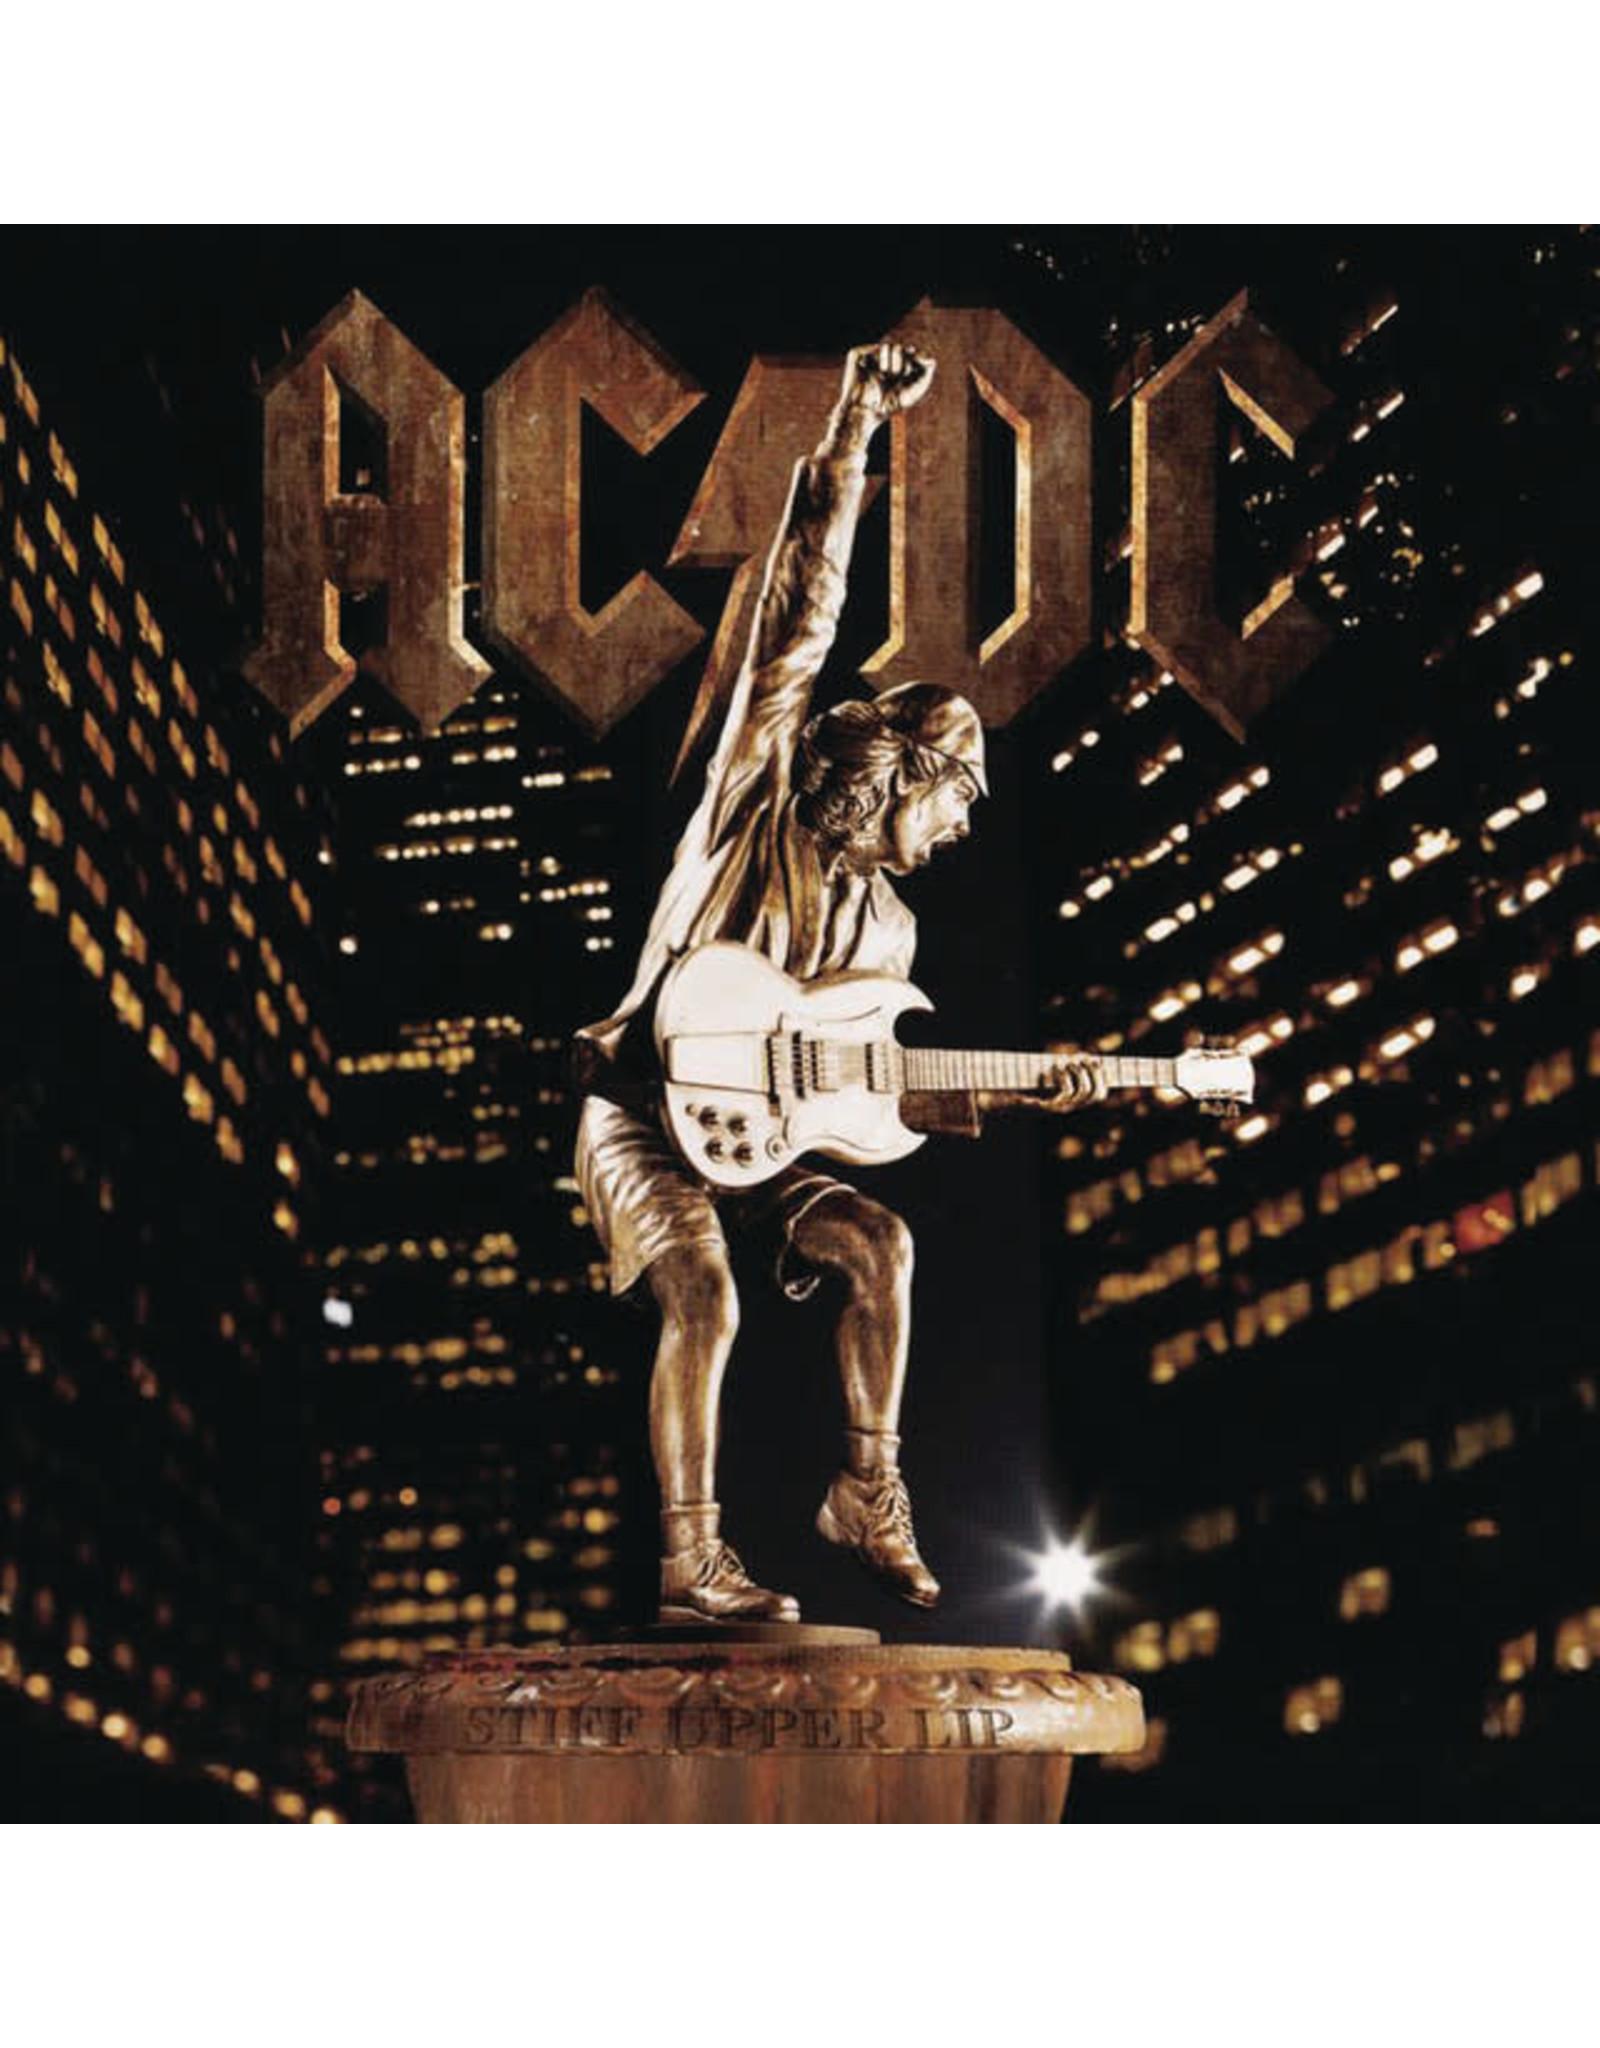 Vinyl AC/DC - Stiff Upper Lip.  Final Sale